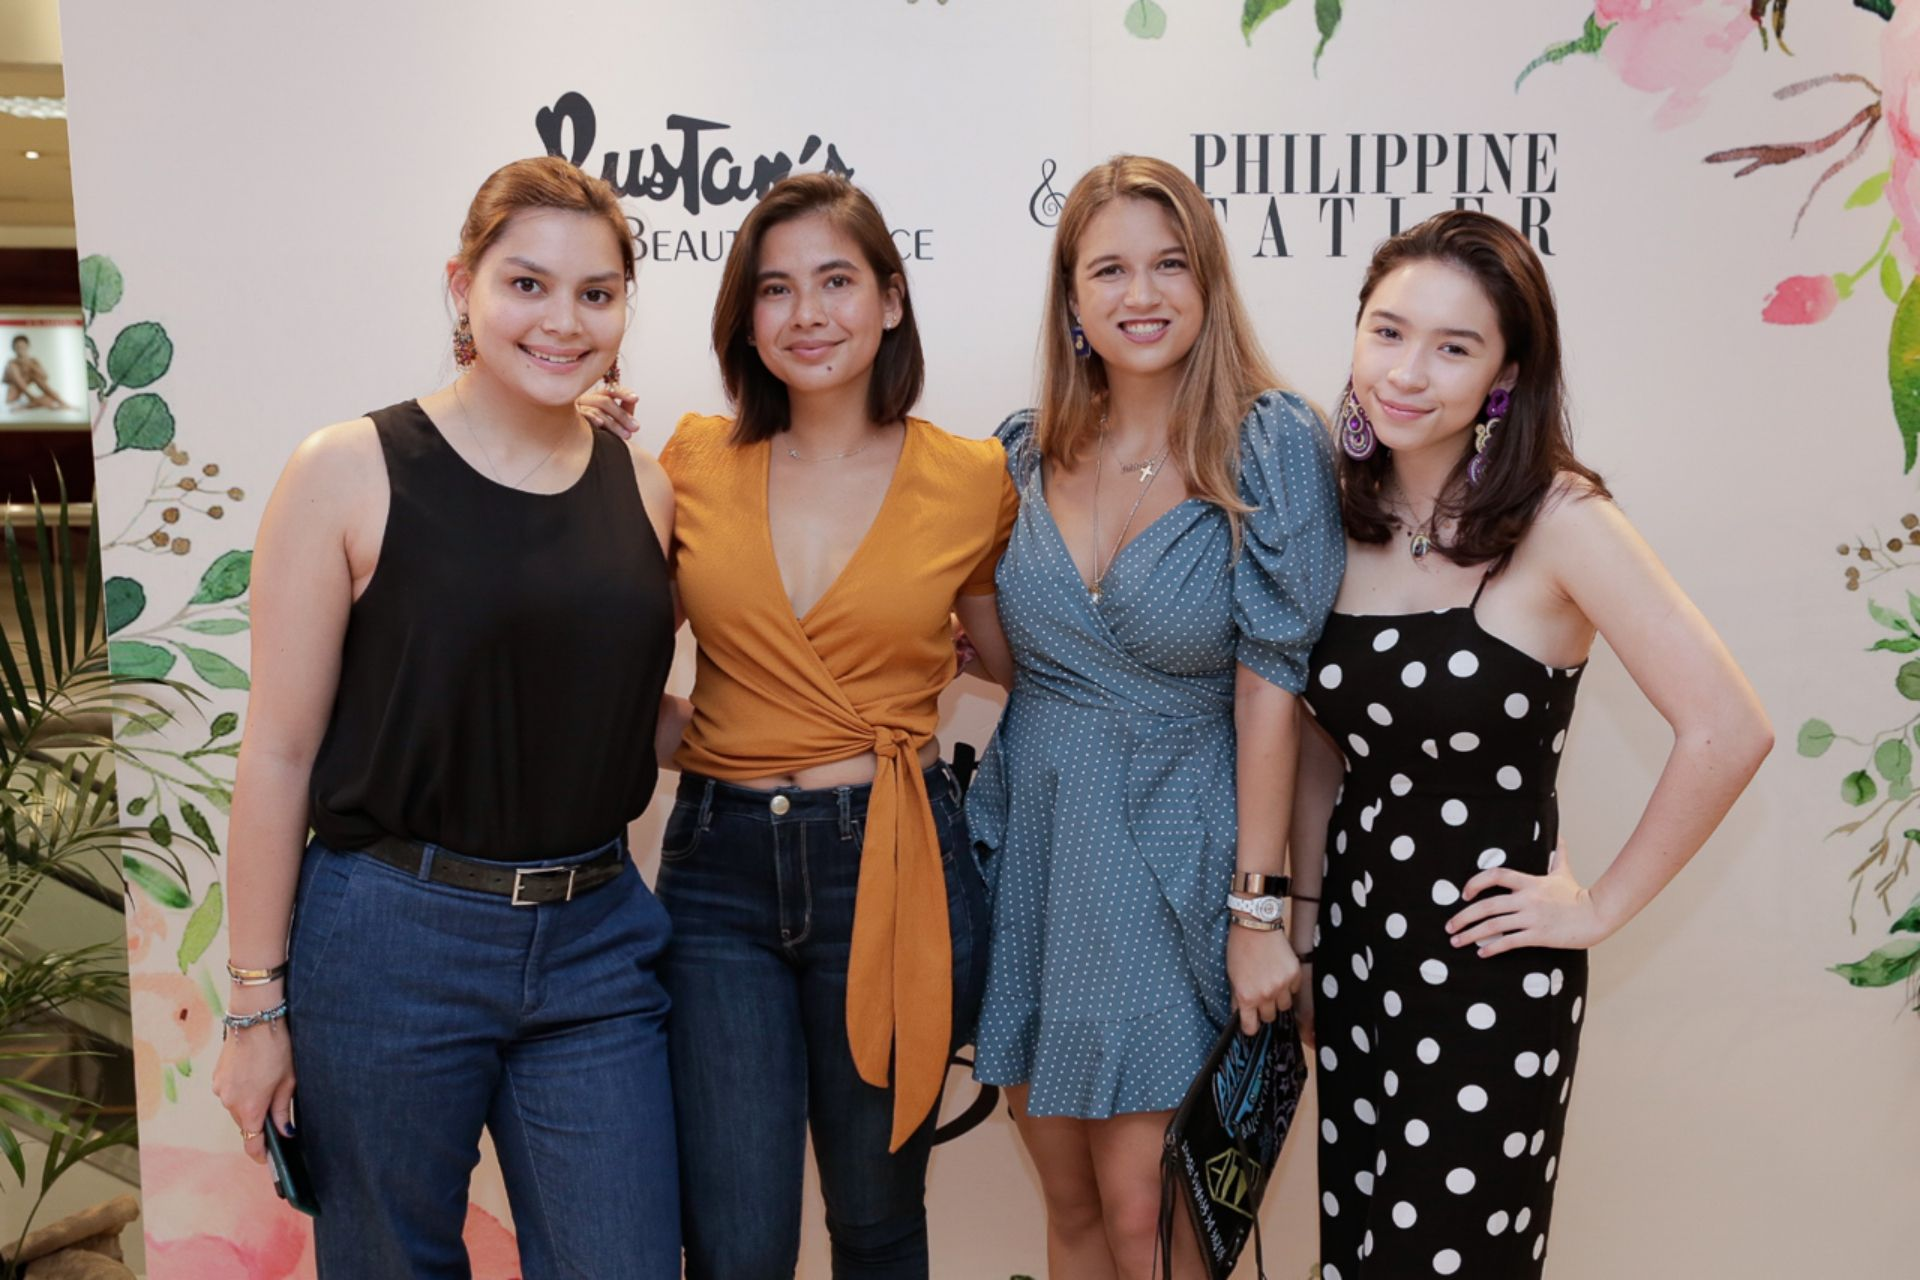 Ines Tambunting, Monica Dizon, Natalia Pena, Rocio Tambunting